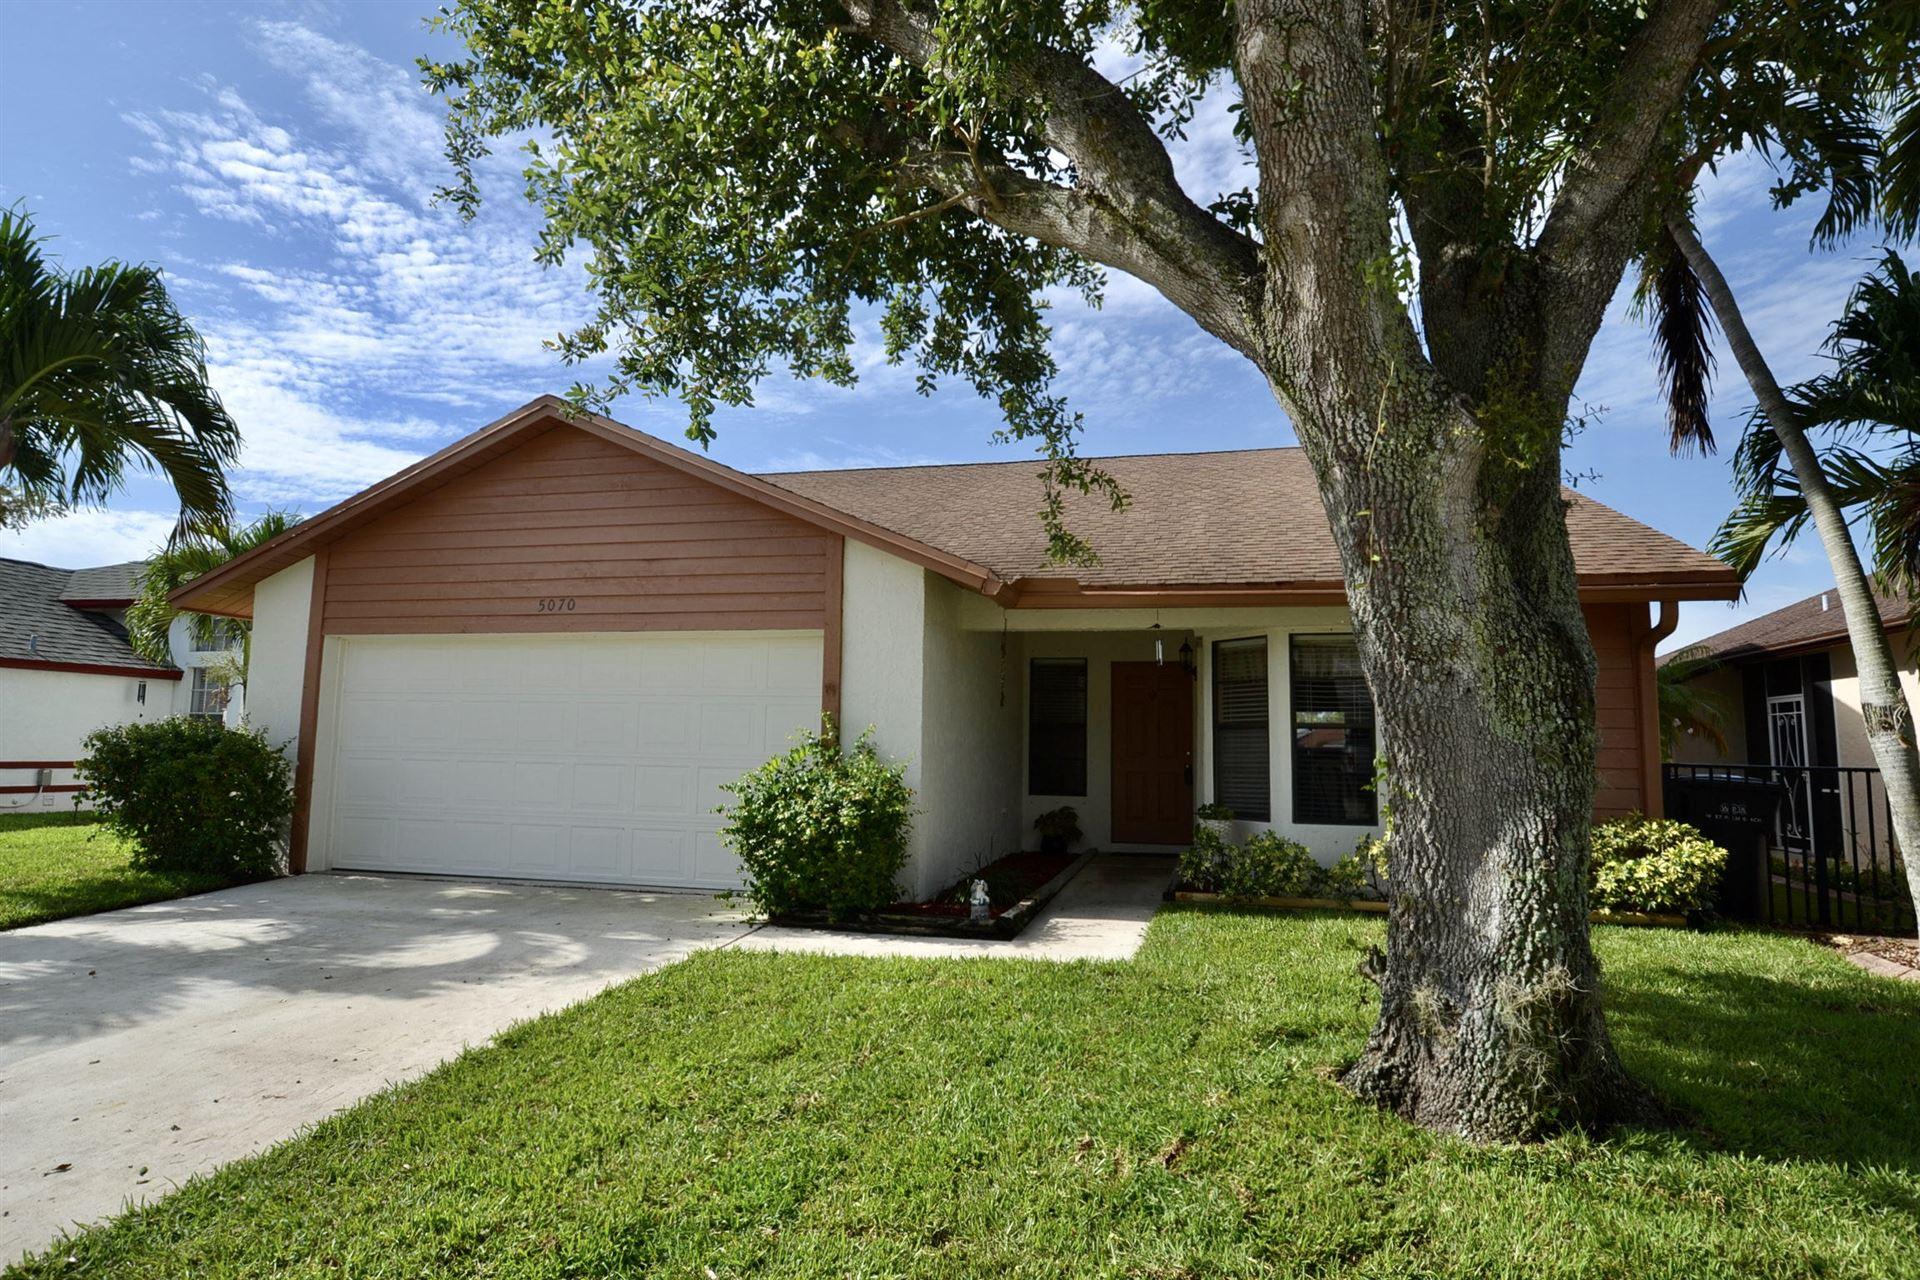 Photo of 5070 Foxhall Drive N, West Palm Beach, FL 33417 (MLS # RX-10715435)